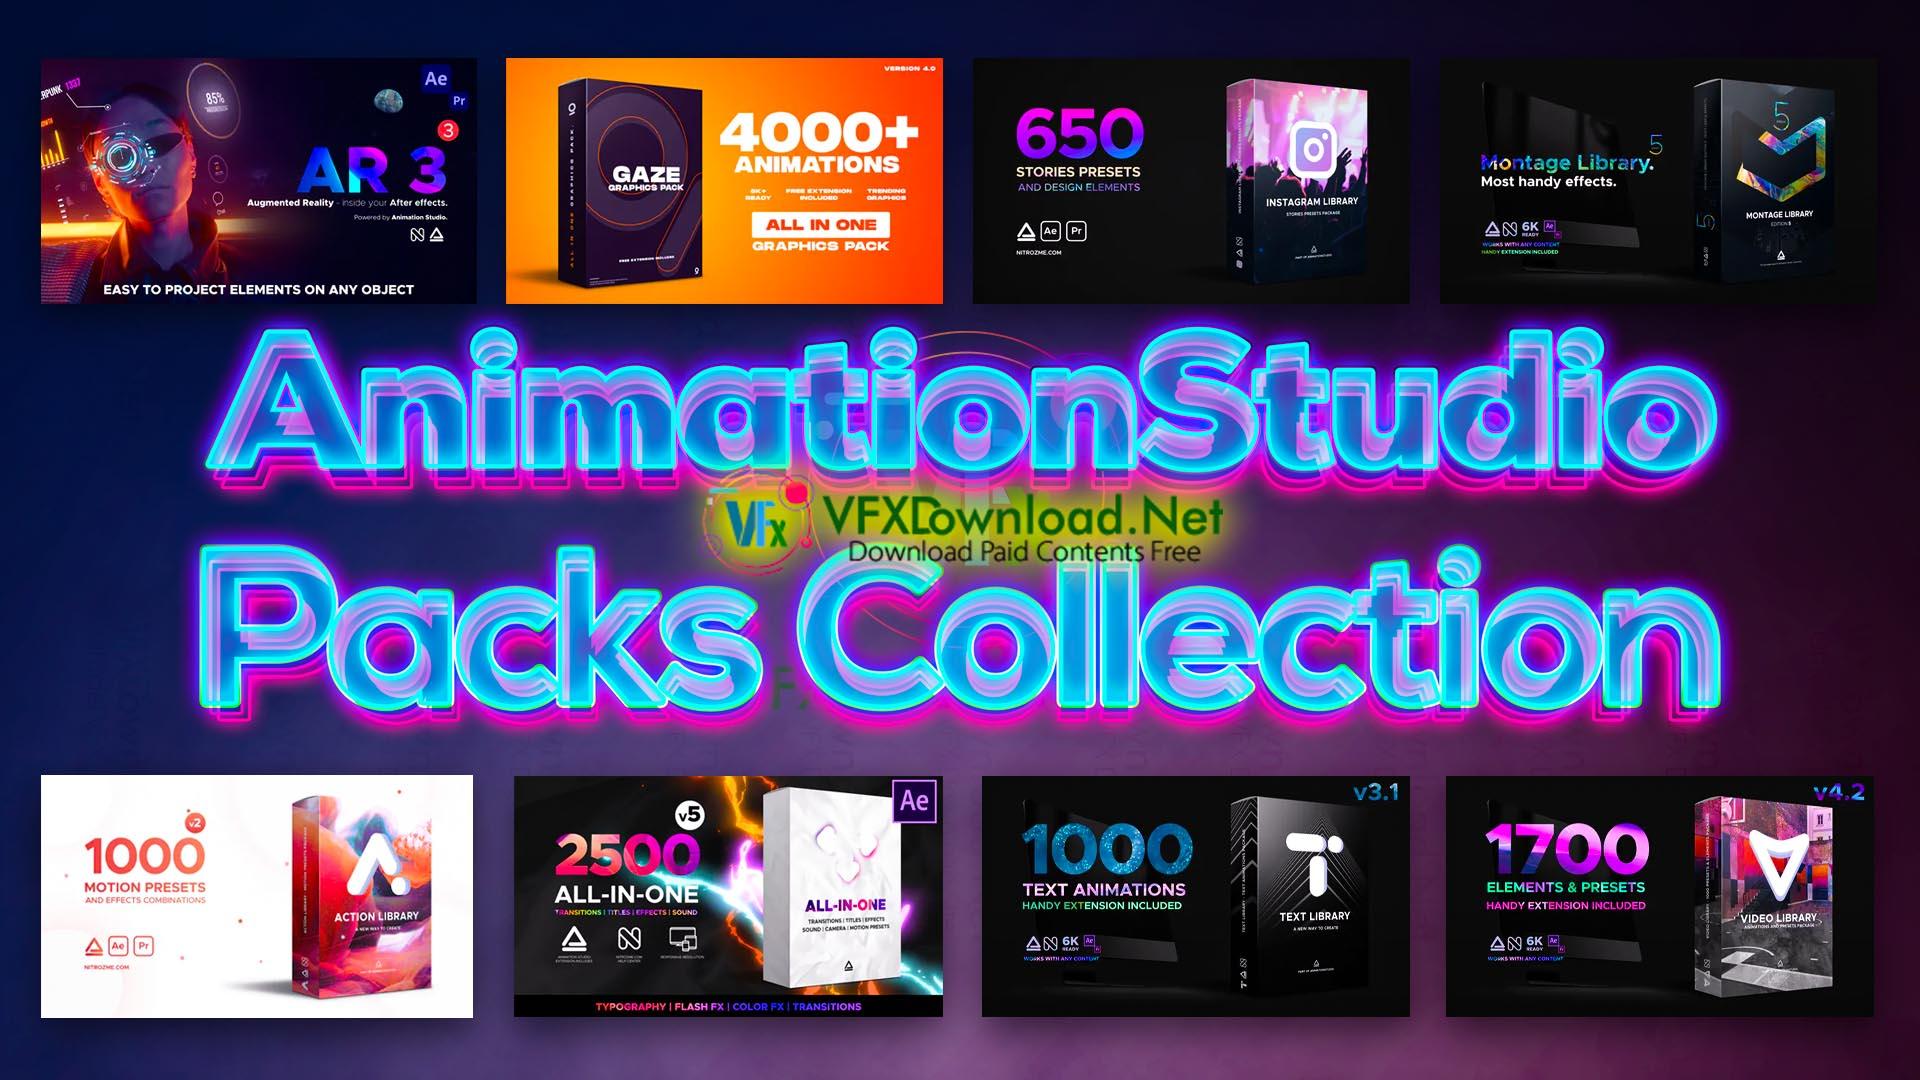 AnimationStudio Packs Collection 2021